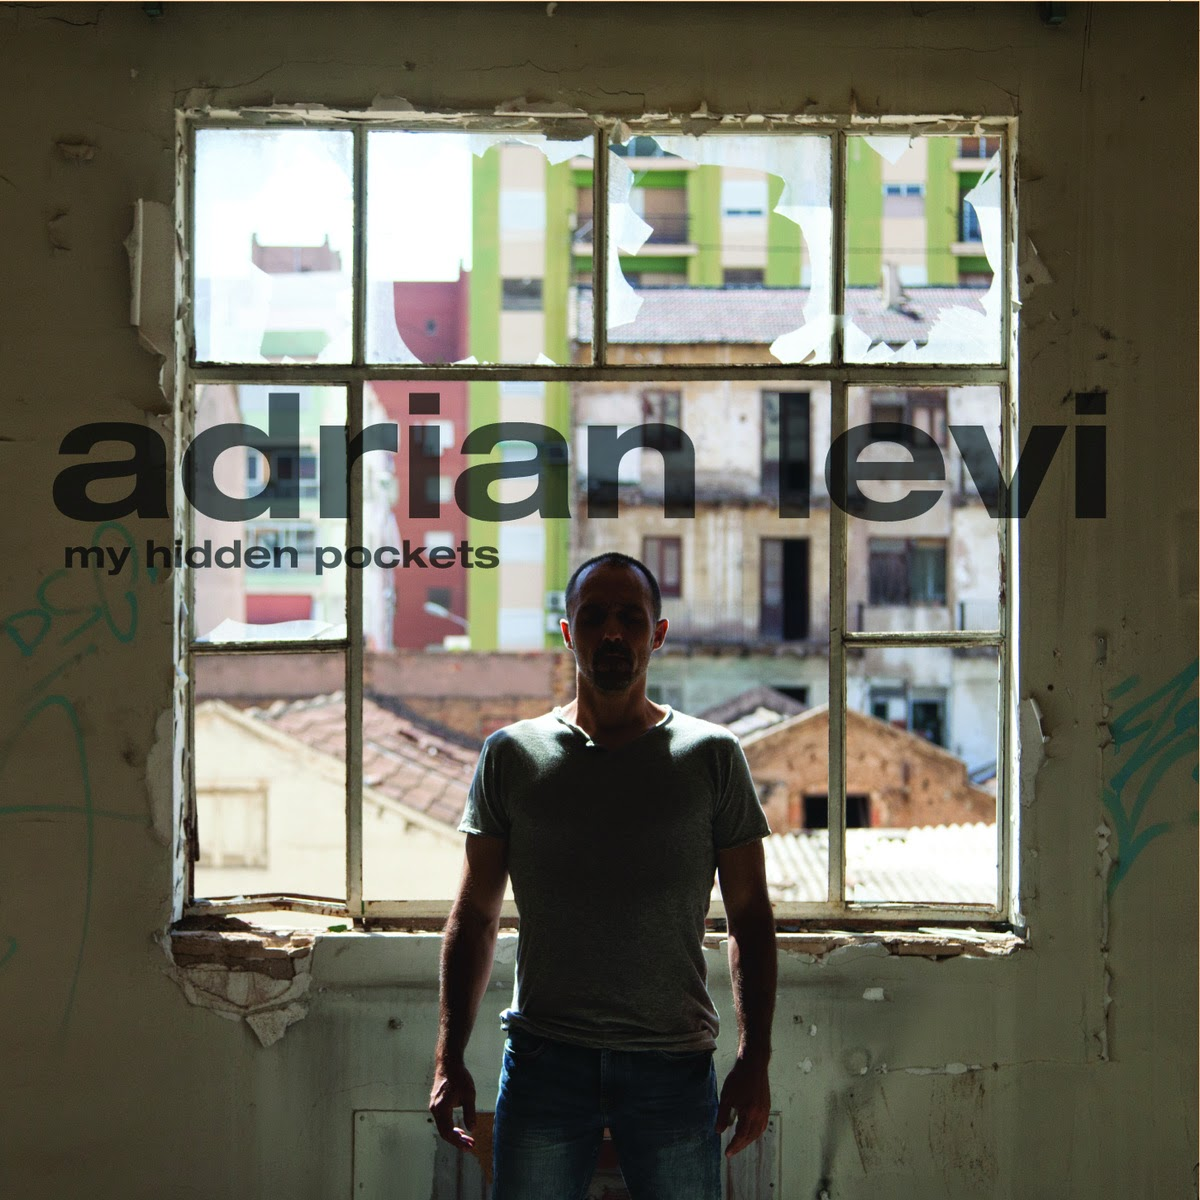 http://adrianlevi.bandcamp.com/releases